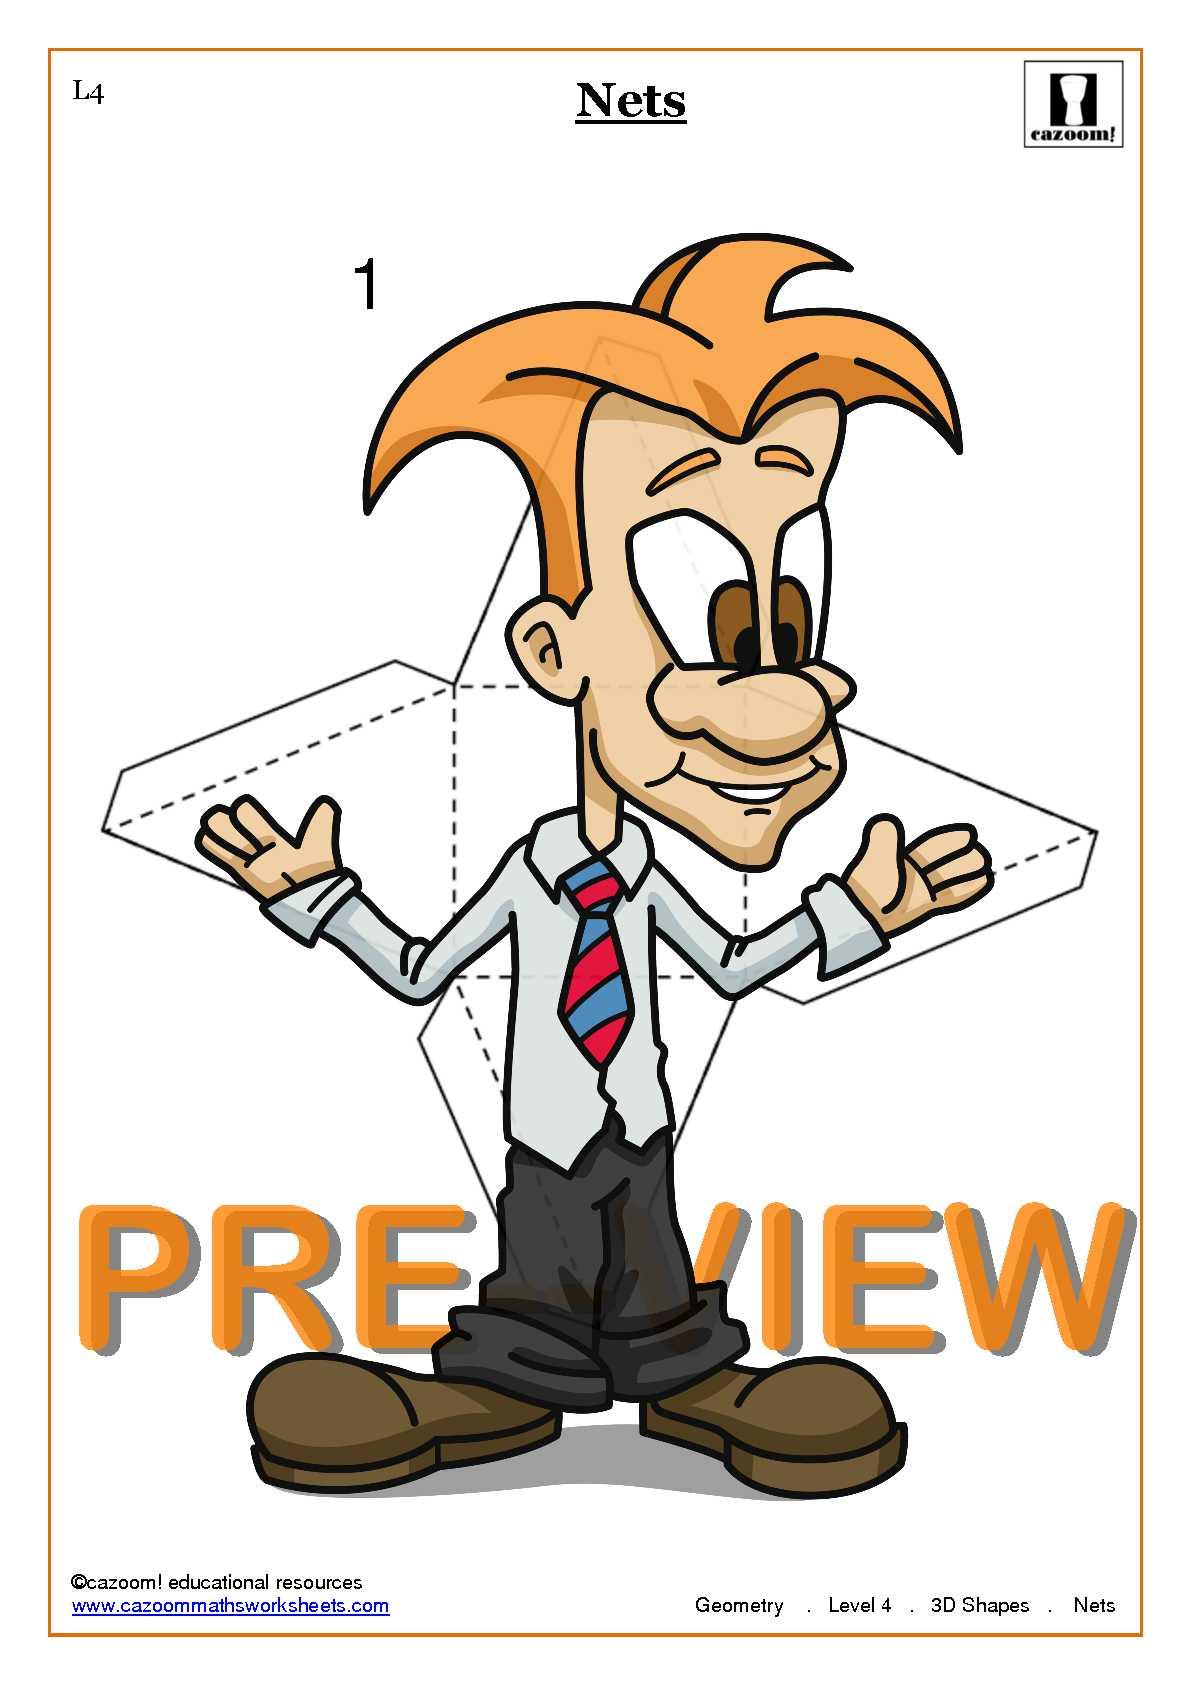 math worksheet : level 4 maths revision worksheets  educational math activities : Level 4 Maths Worksheets